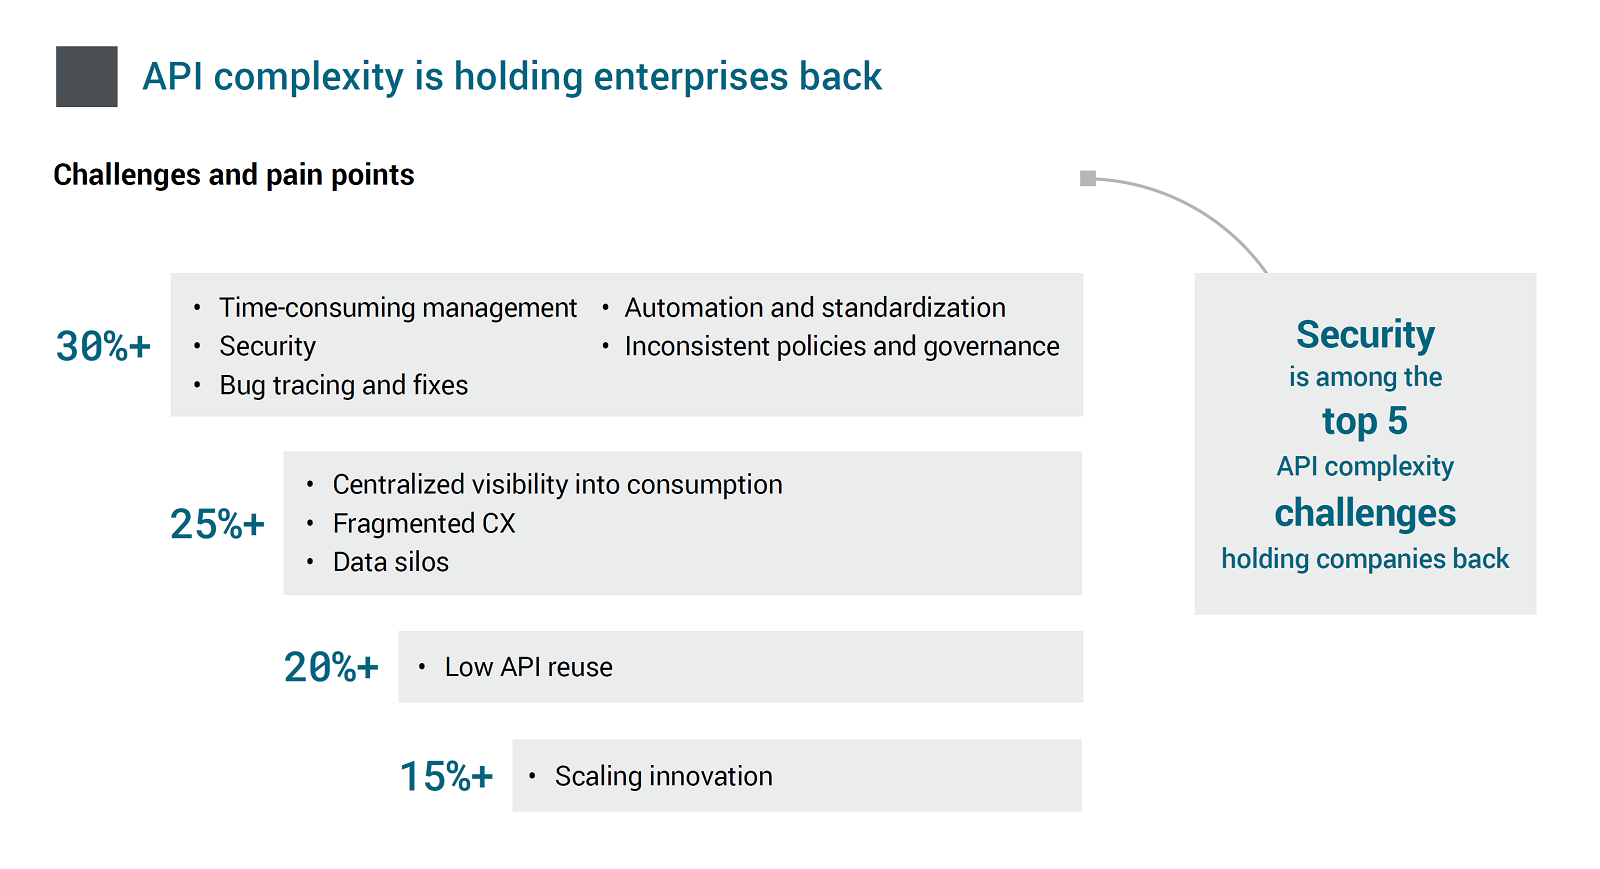 API complexity is holding enterprises back